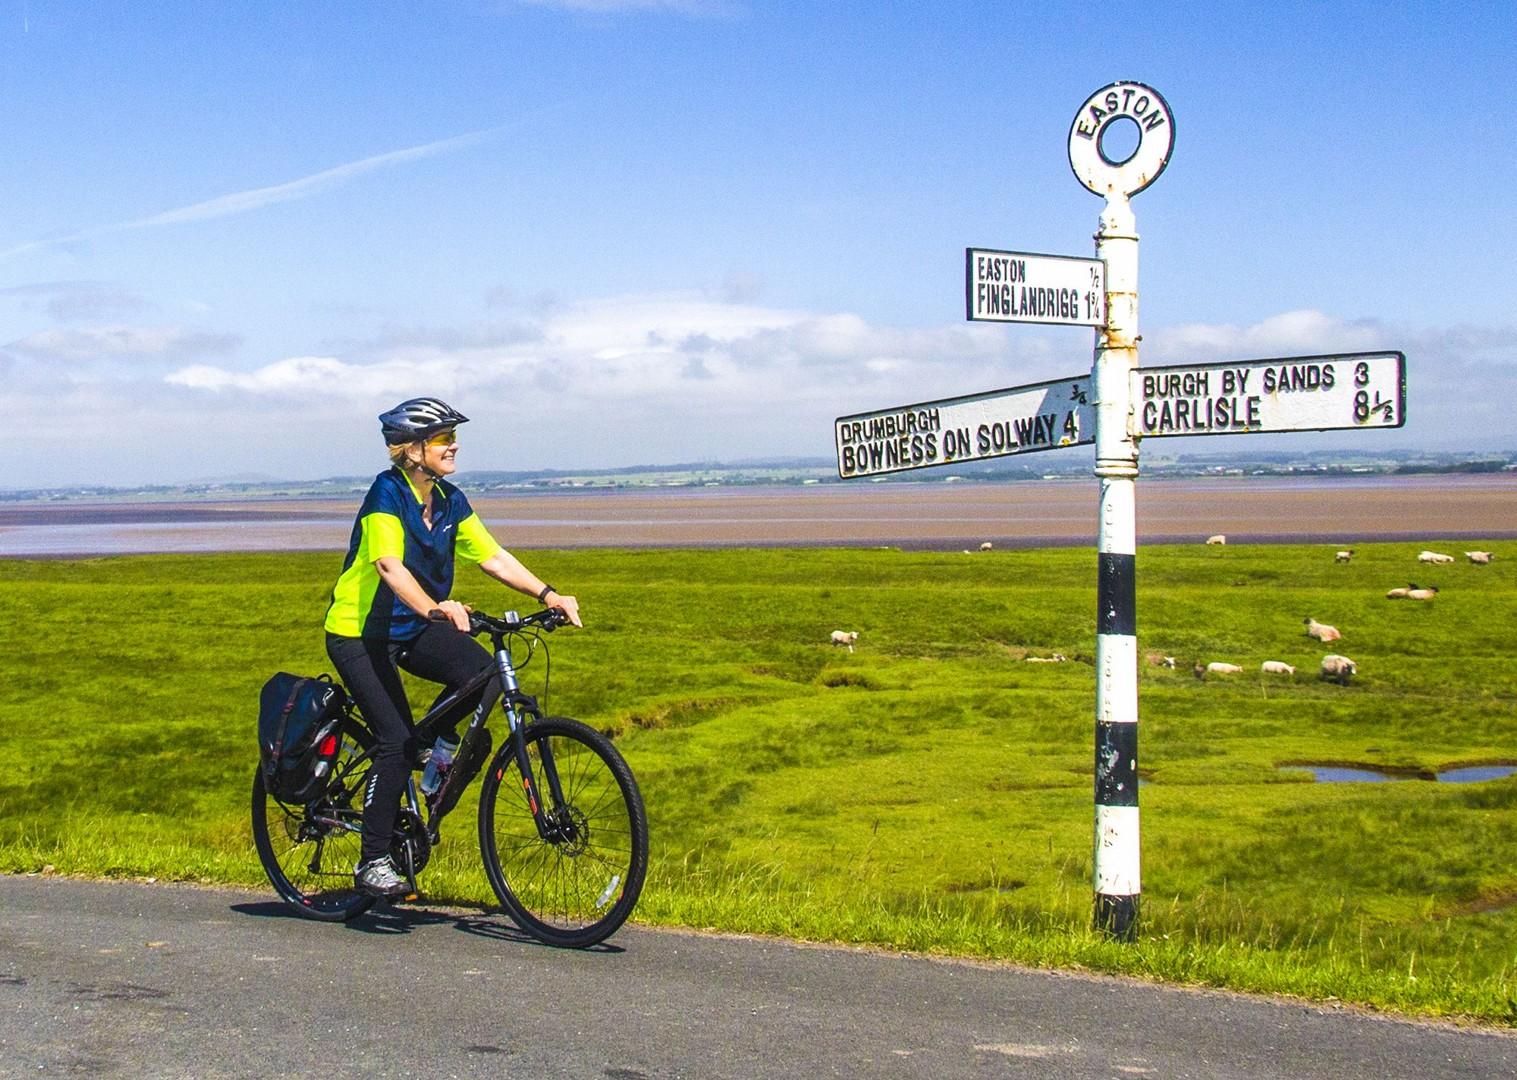 1706_0149-2.jpg - UK - Hadrian's Cycleway - 2 Days Cycling - Self-Guided Leisure Cycling Holiday - Leisure Cycling